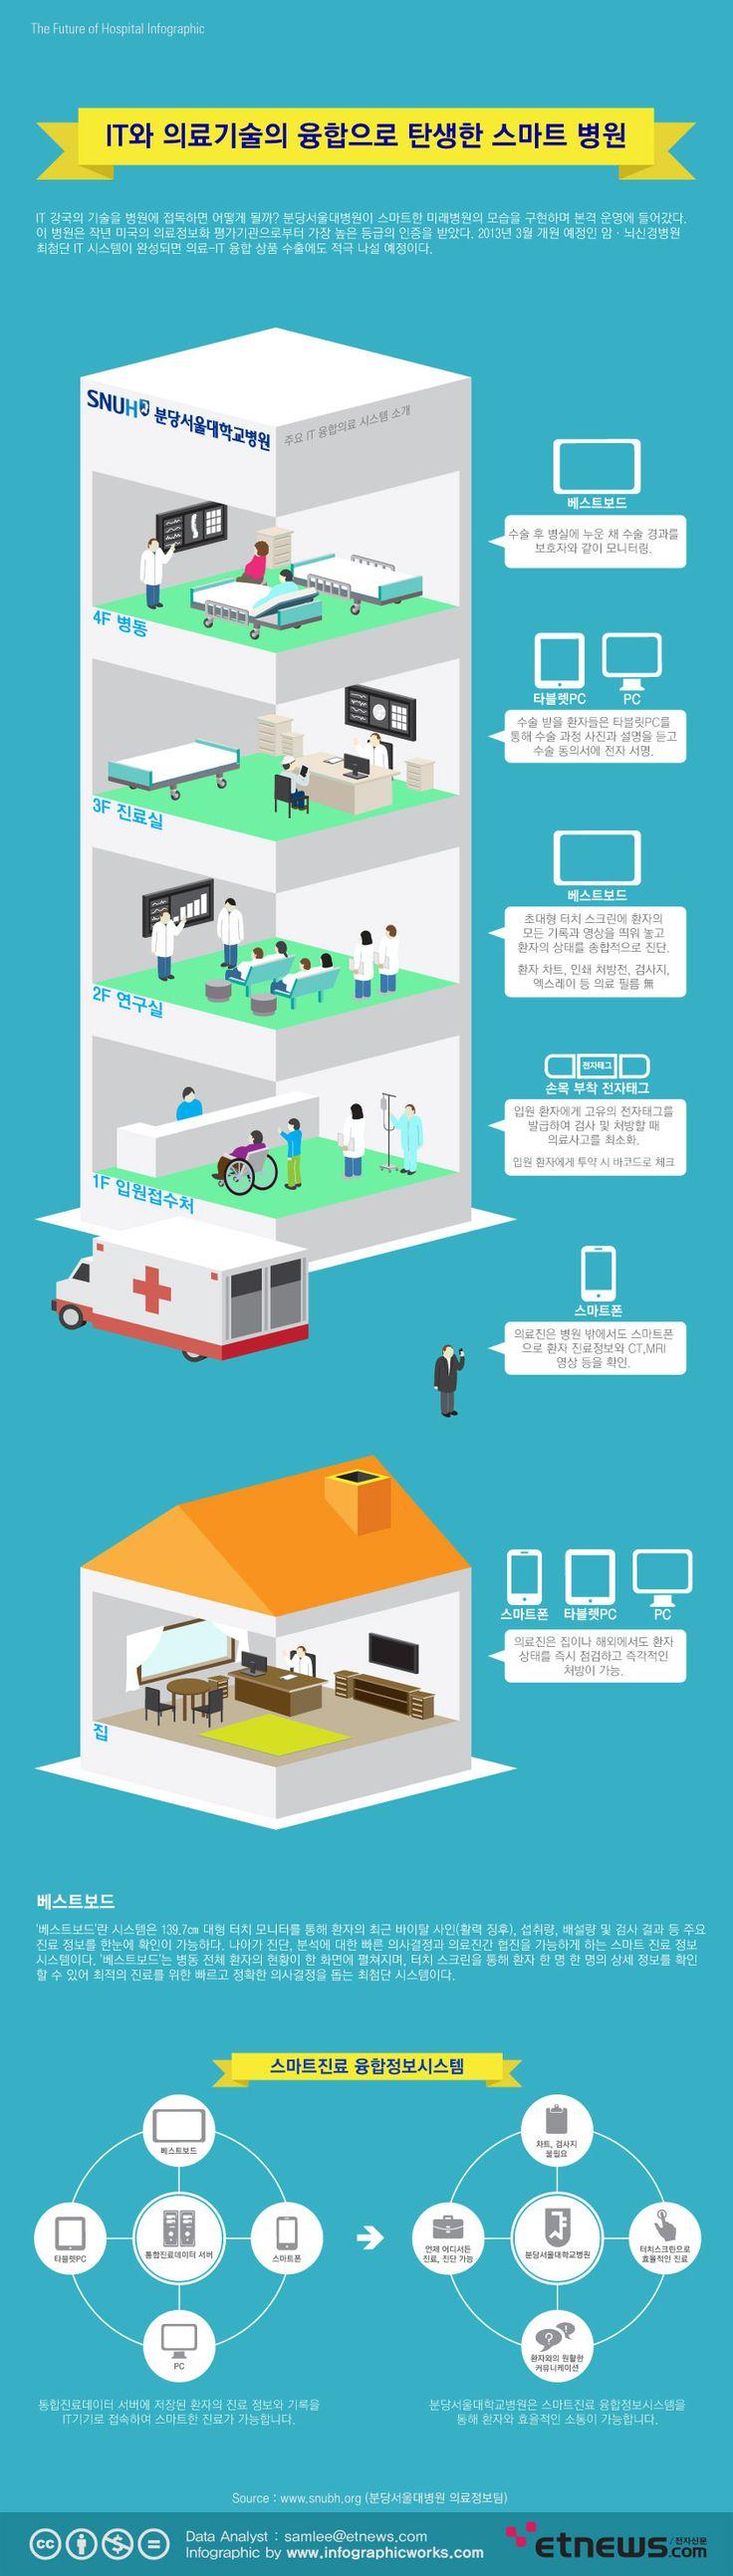 IT와 의료기술의 융합으로 탄생한 스마트 병원에 관한 인포그래픽  Source_http://www.etnews.com/news/economy/education/2609897_1491.html